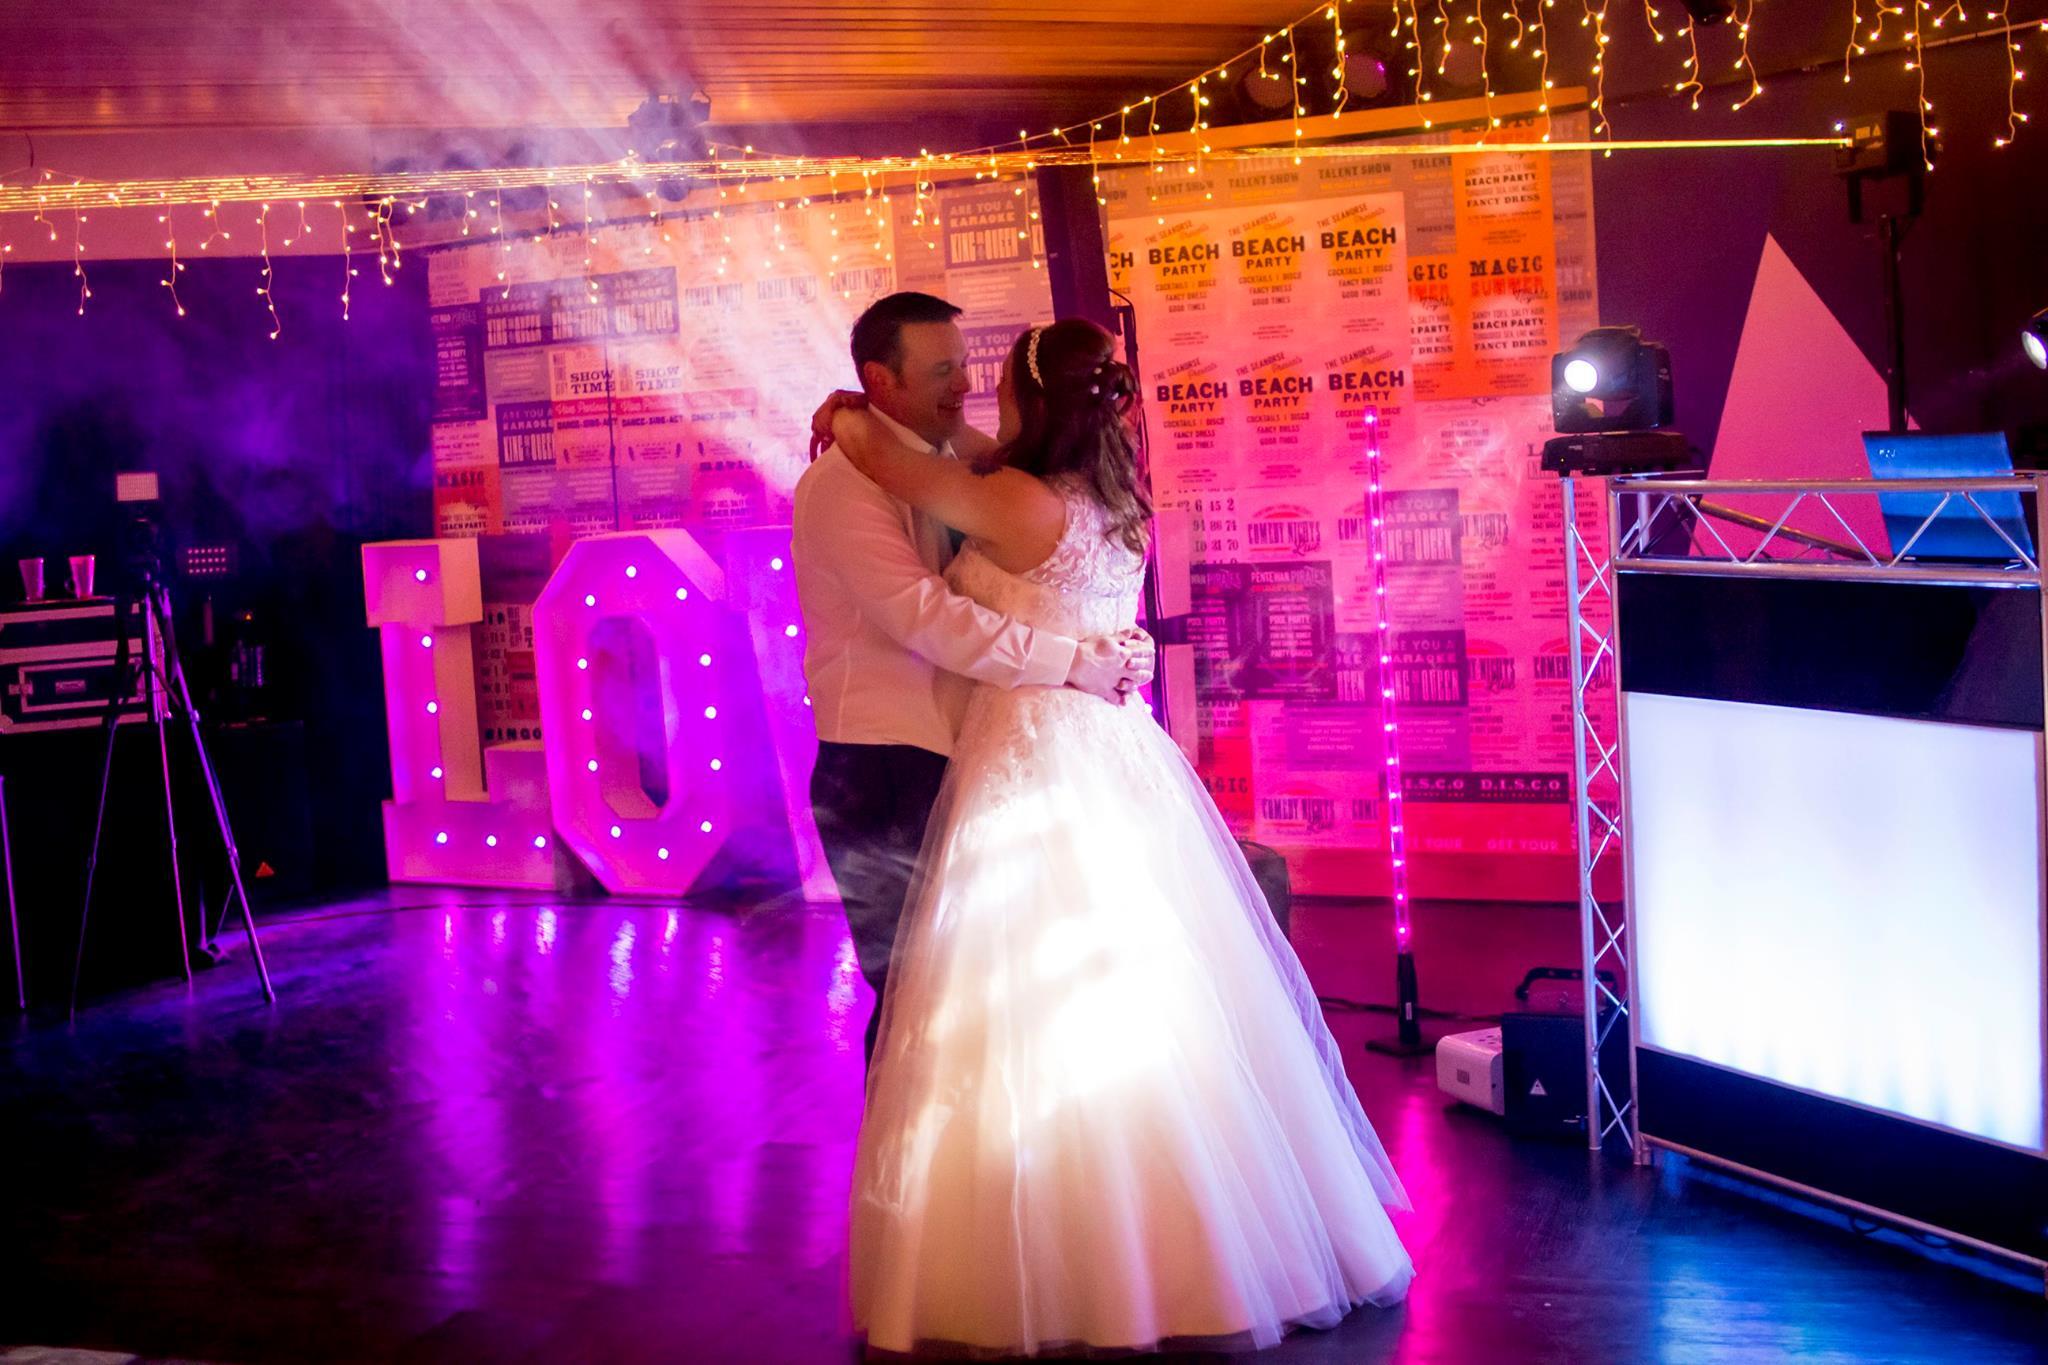 cornwall wedding disco dj photographer 14